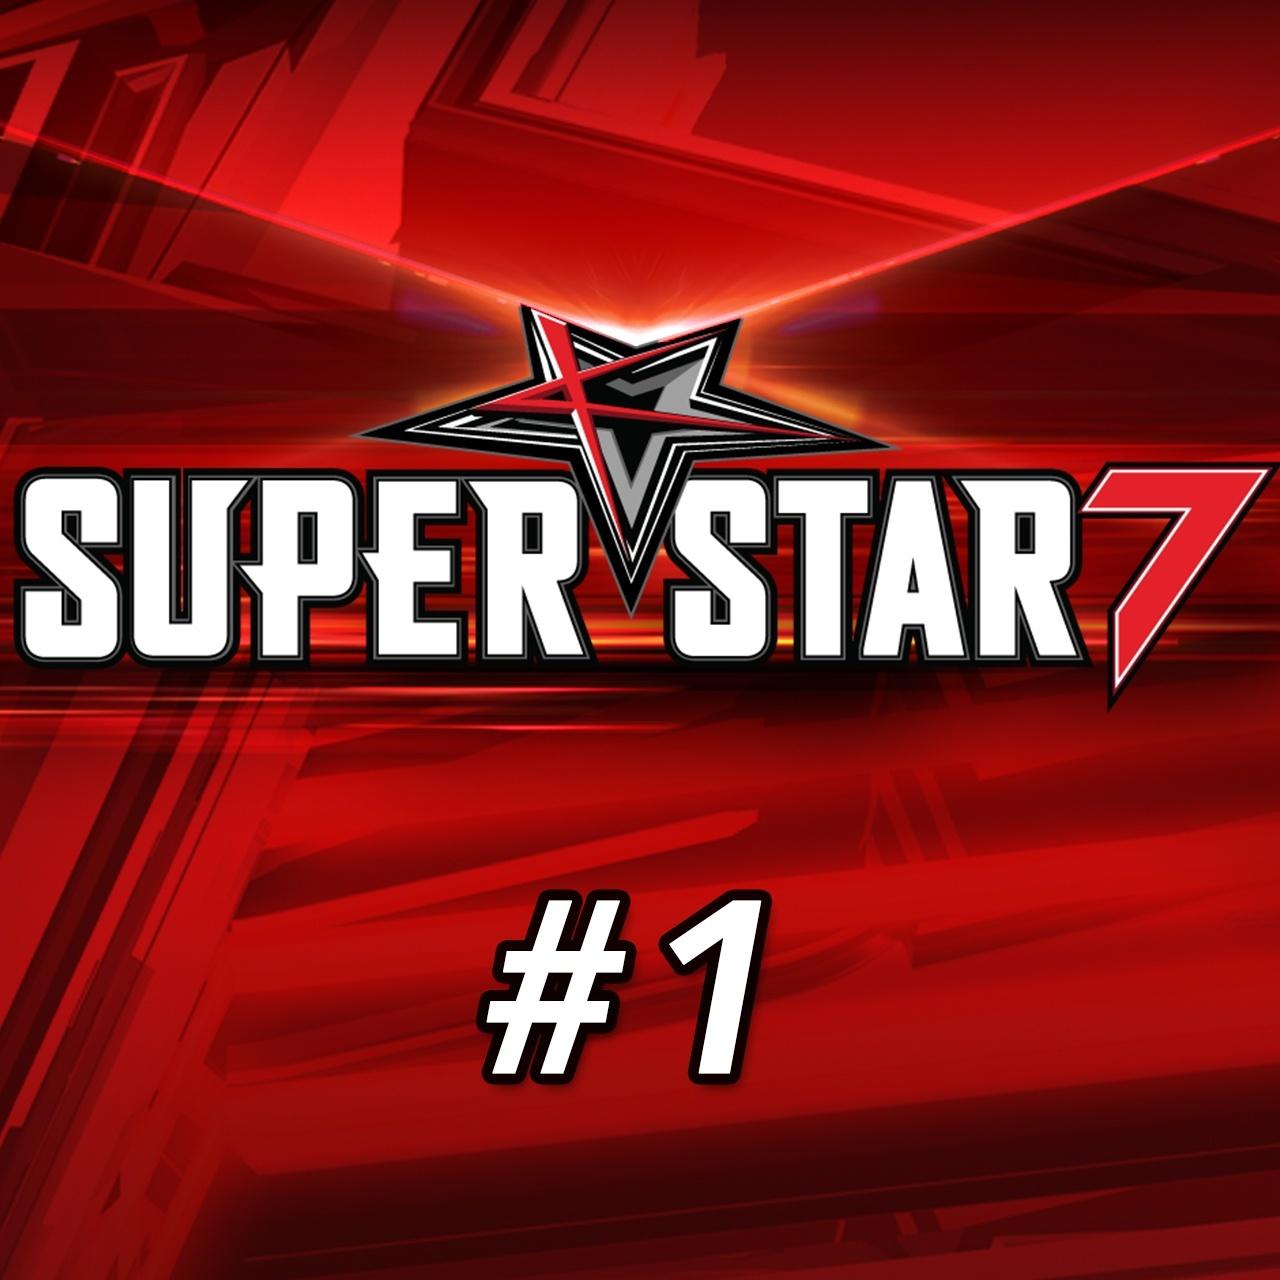 Super Star K 7 Vol. 1 - Various Artists K2Ost free mp3 download korean song kpop kdrama ost lyric 320 kbps